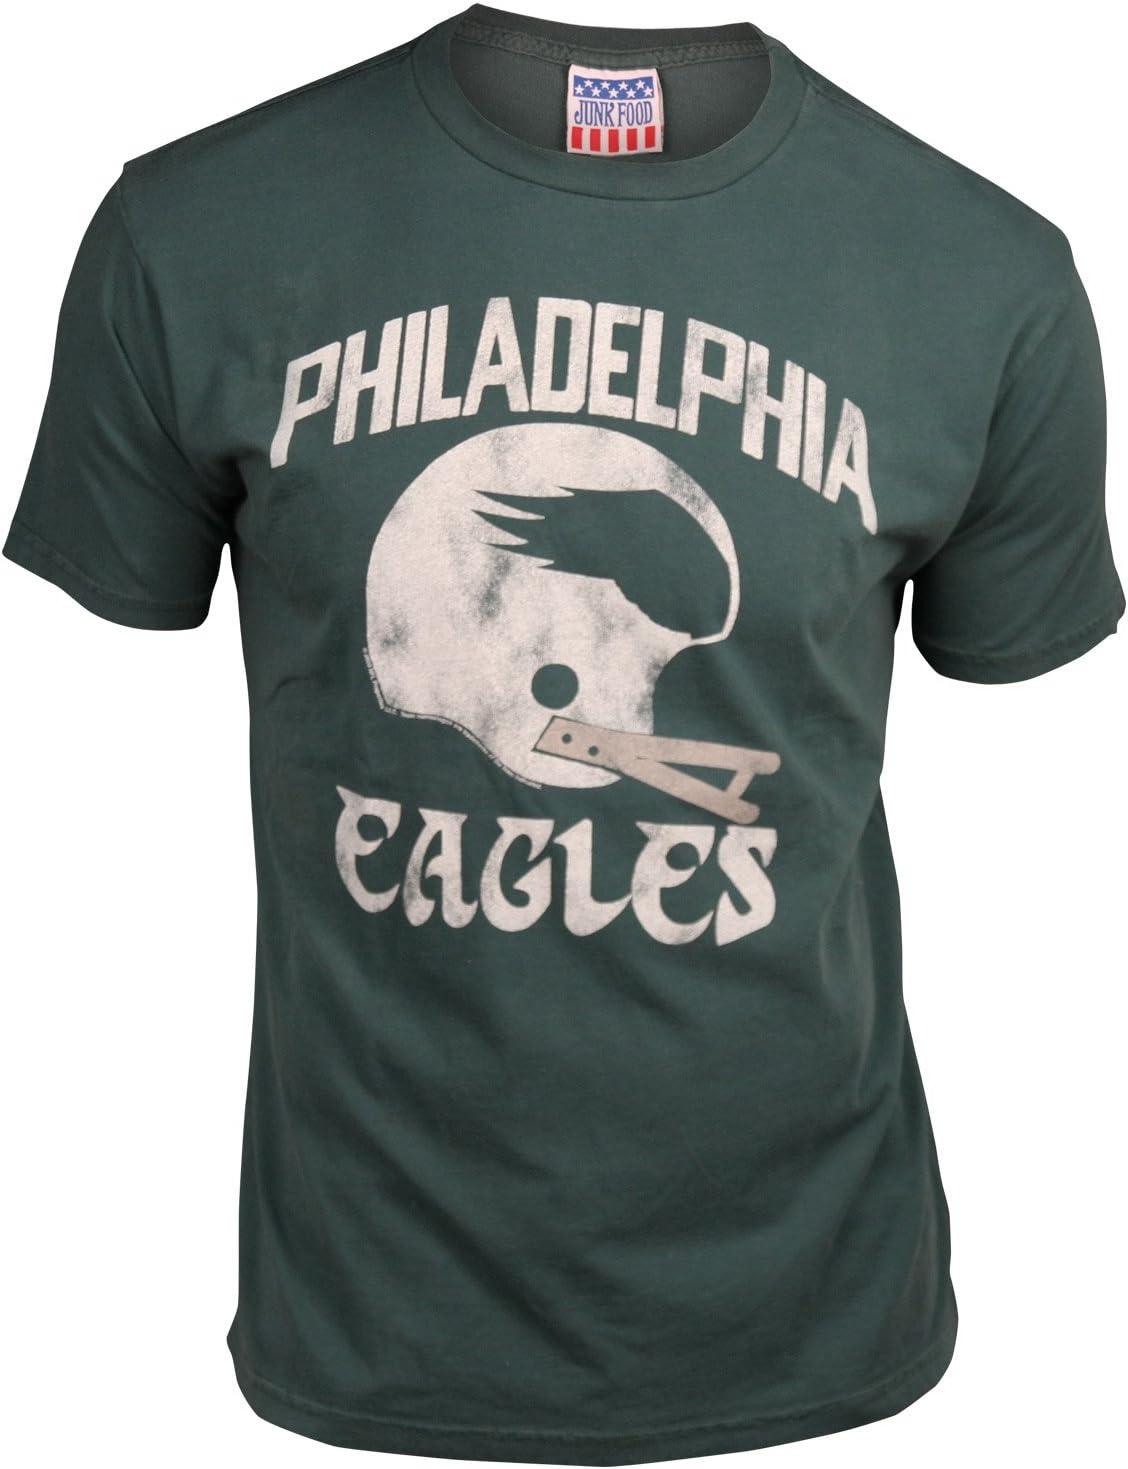 Philadelphia Eagles Men's Retro Vintage T-Shirt